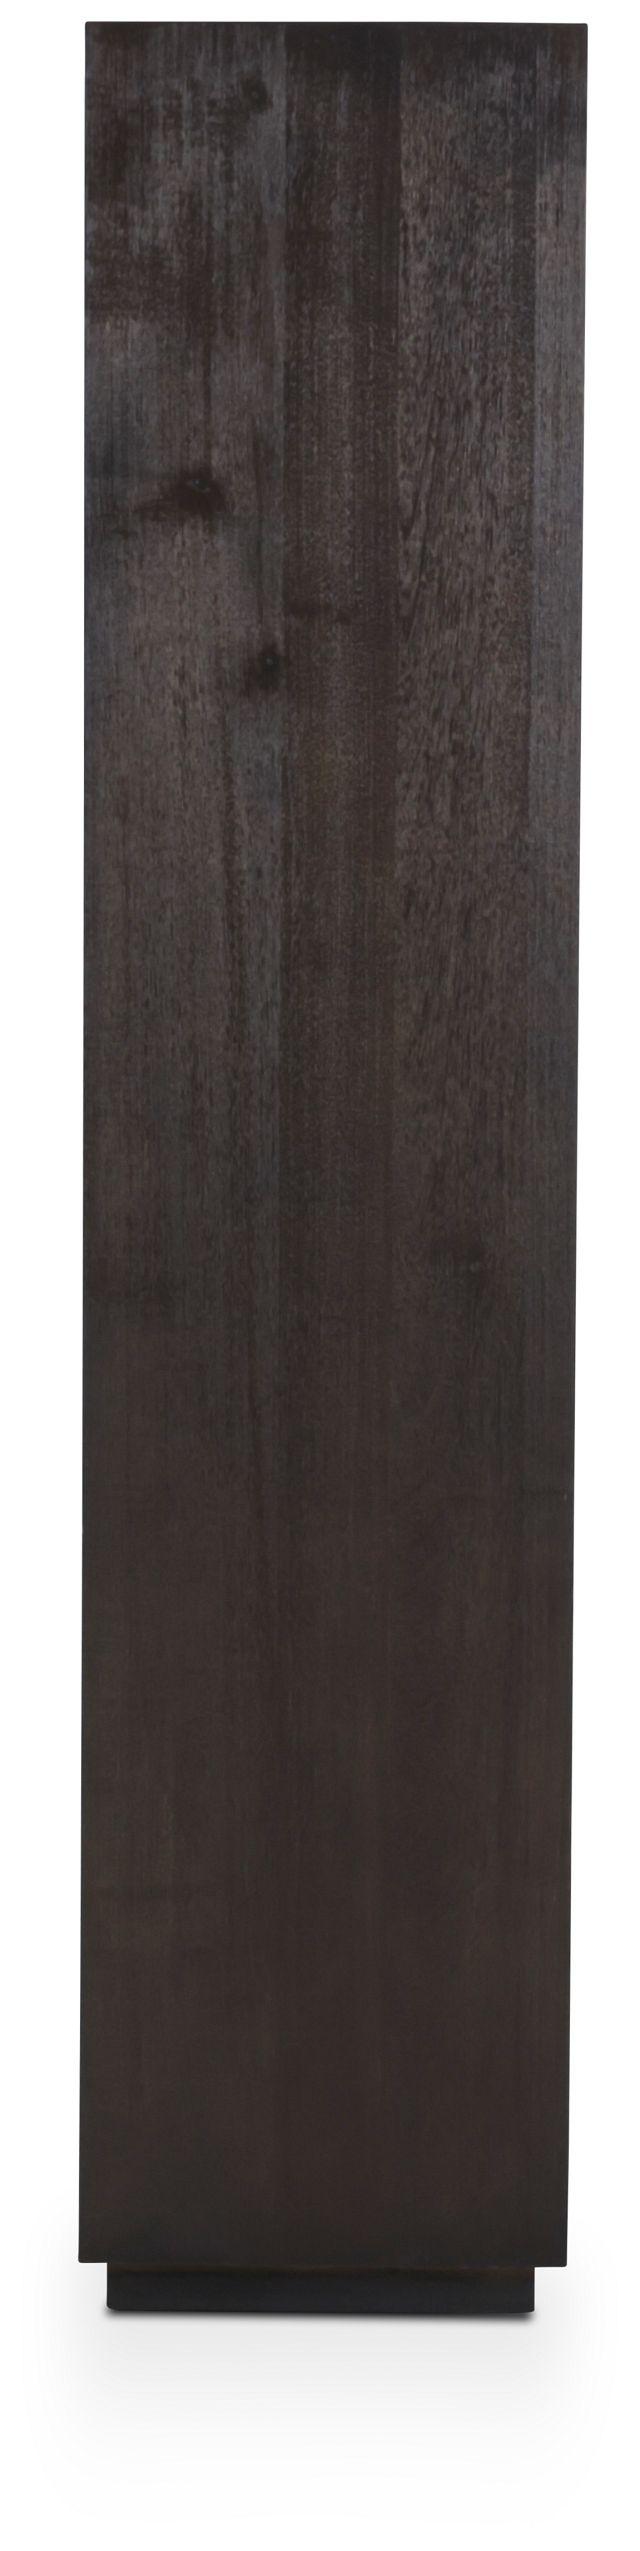 Madden Dark Tone Bookcase (3)